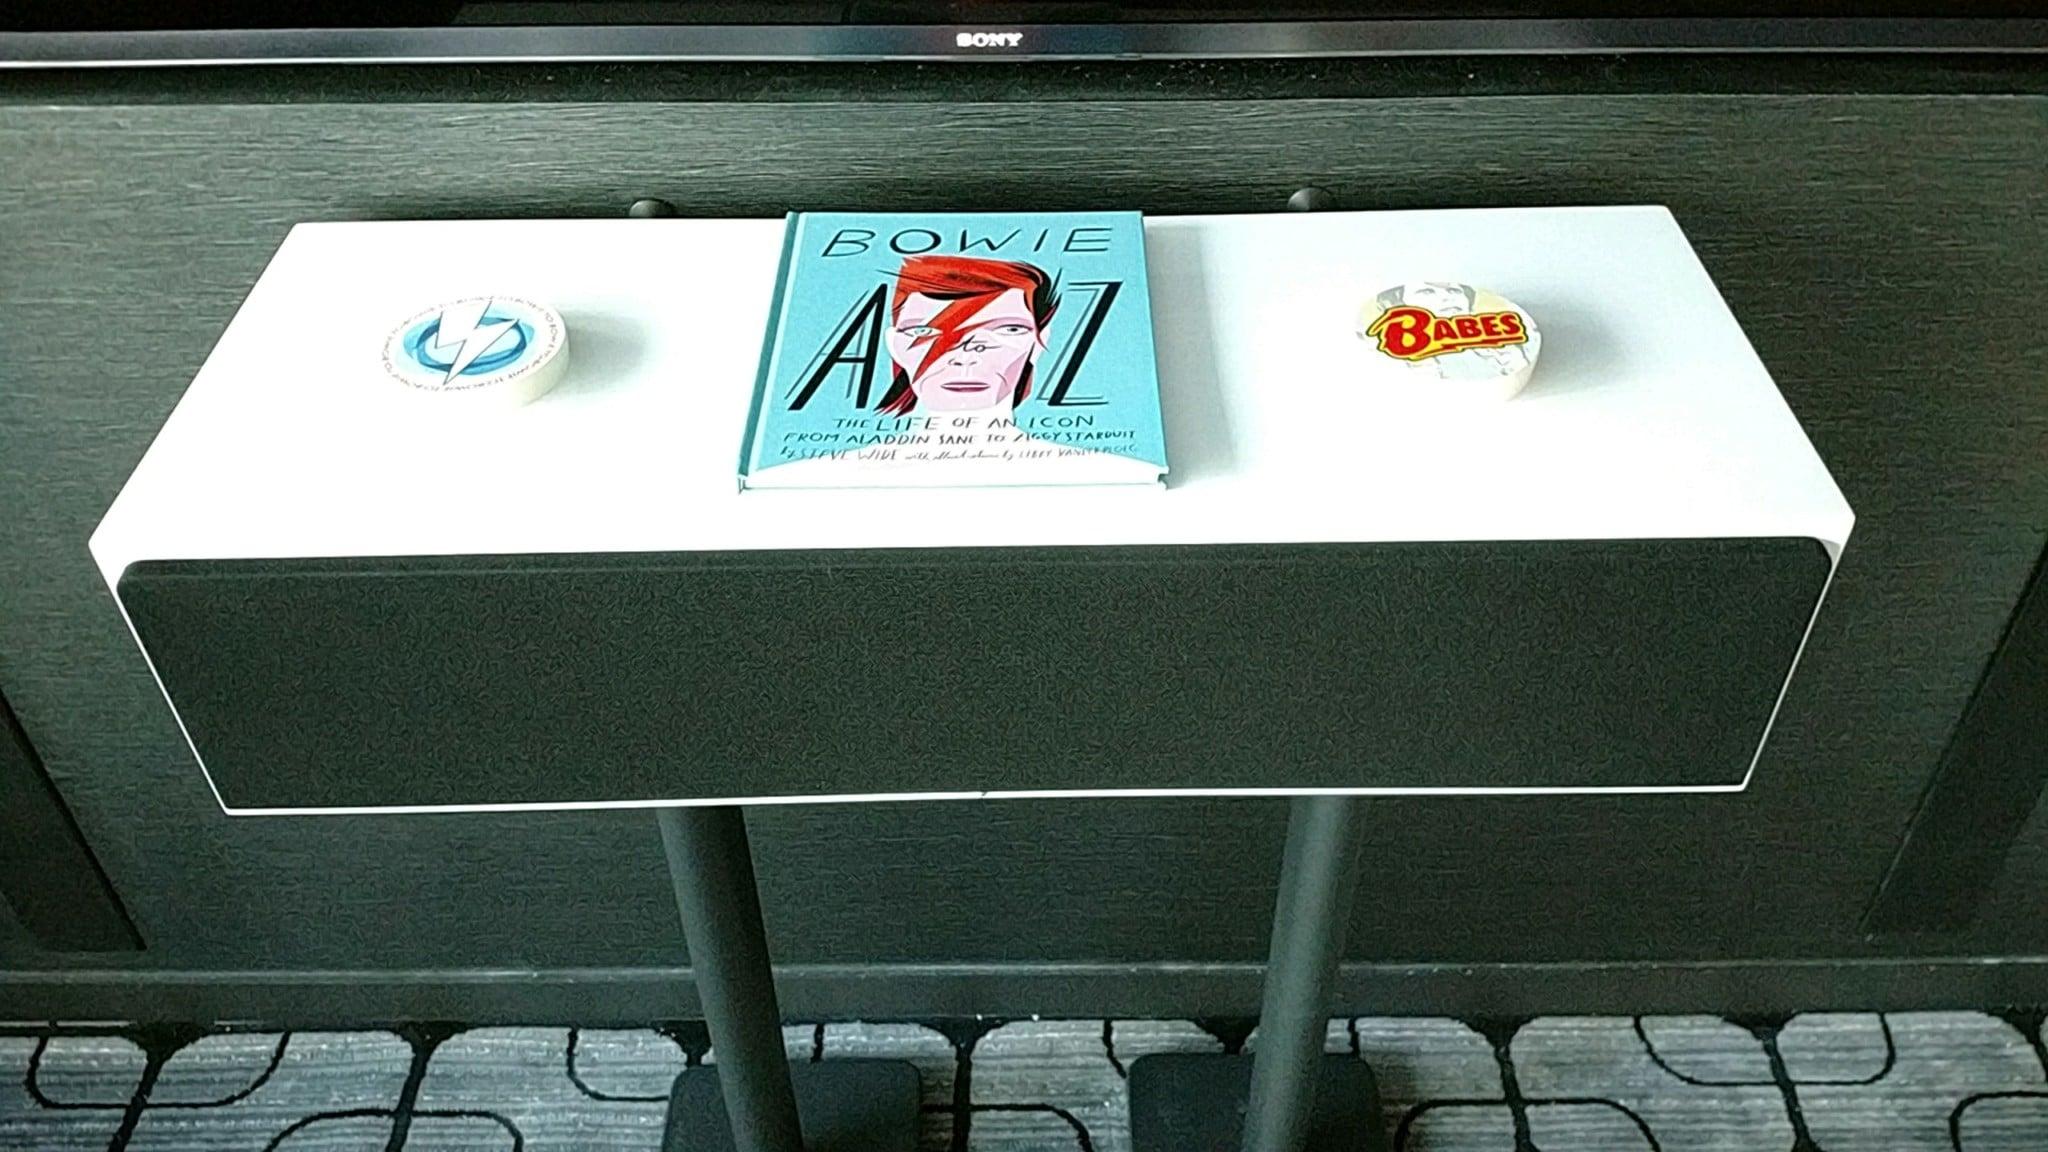 David Bowie Pop Art Show by Mr. Babes